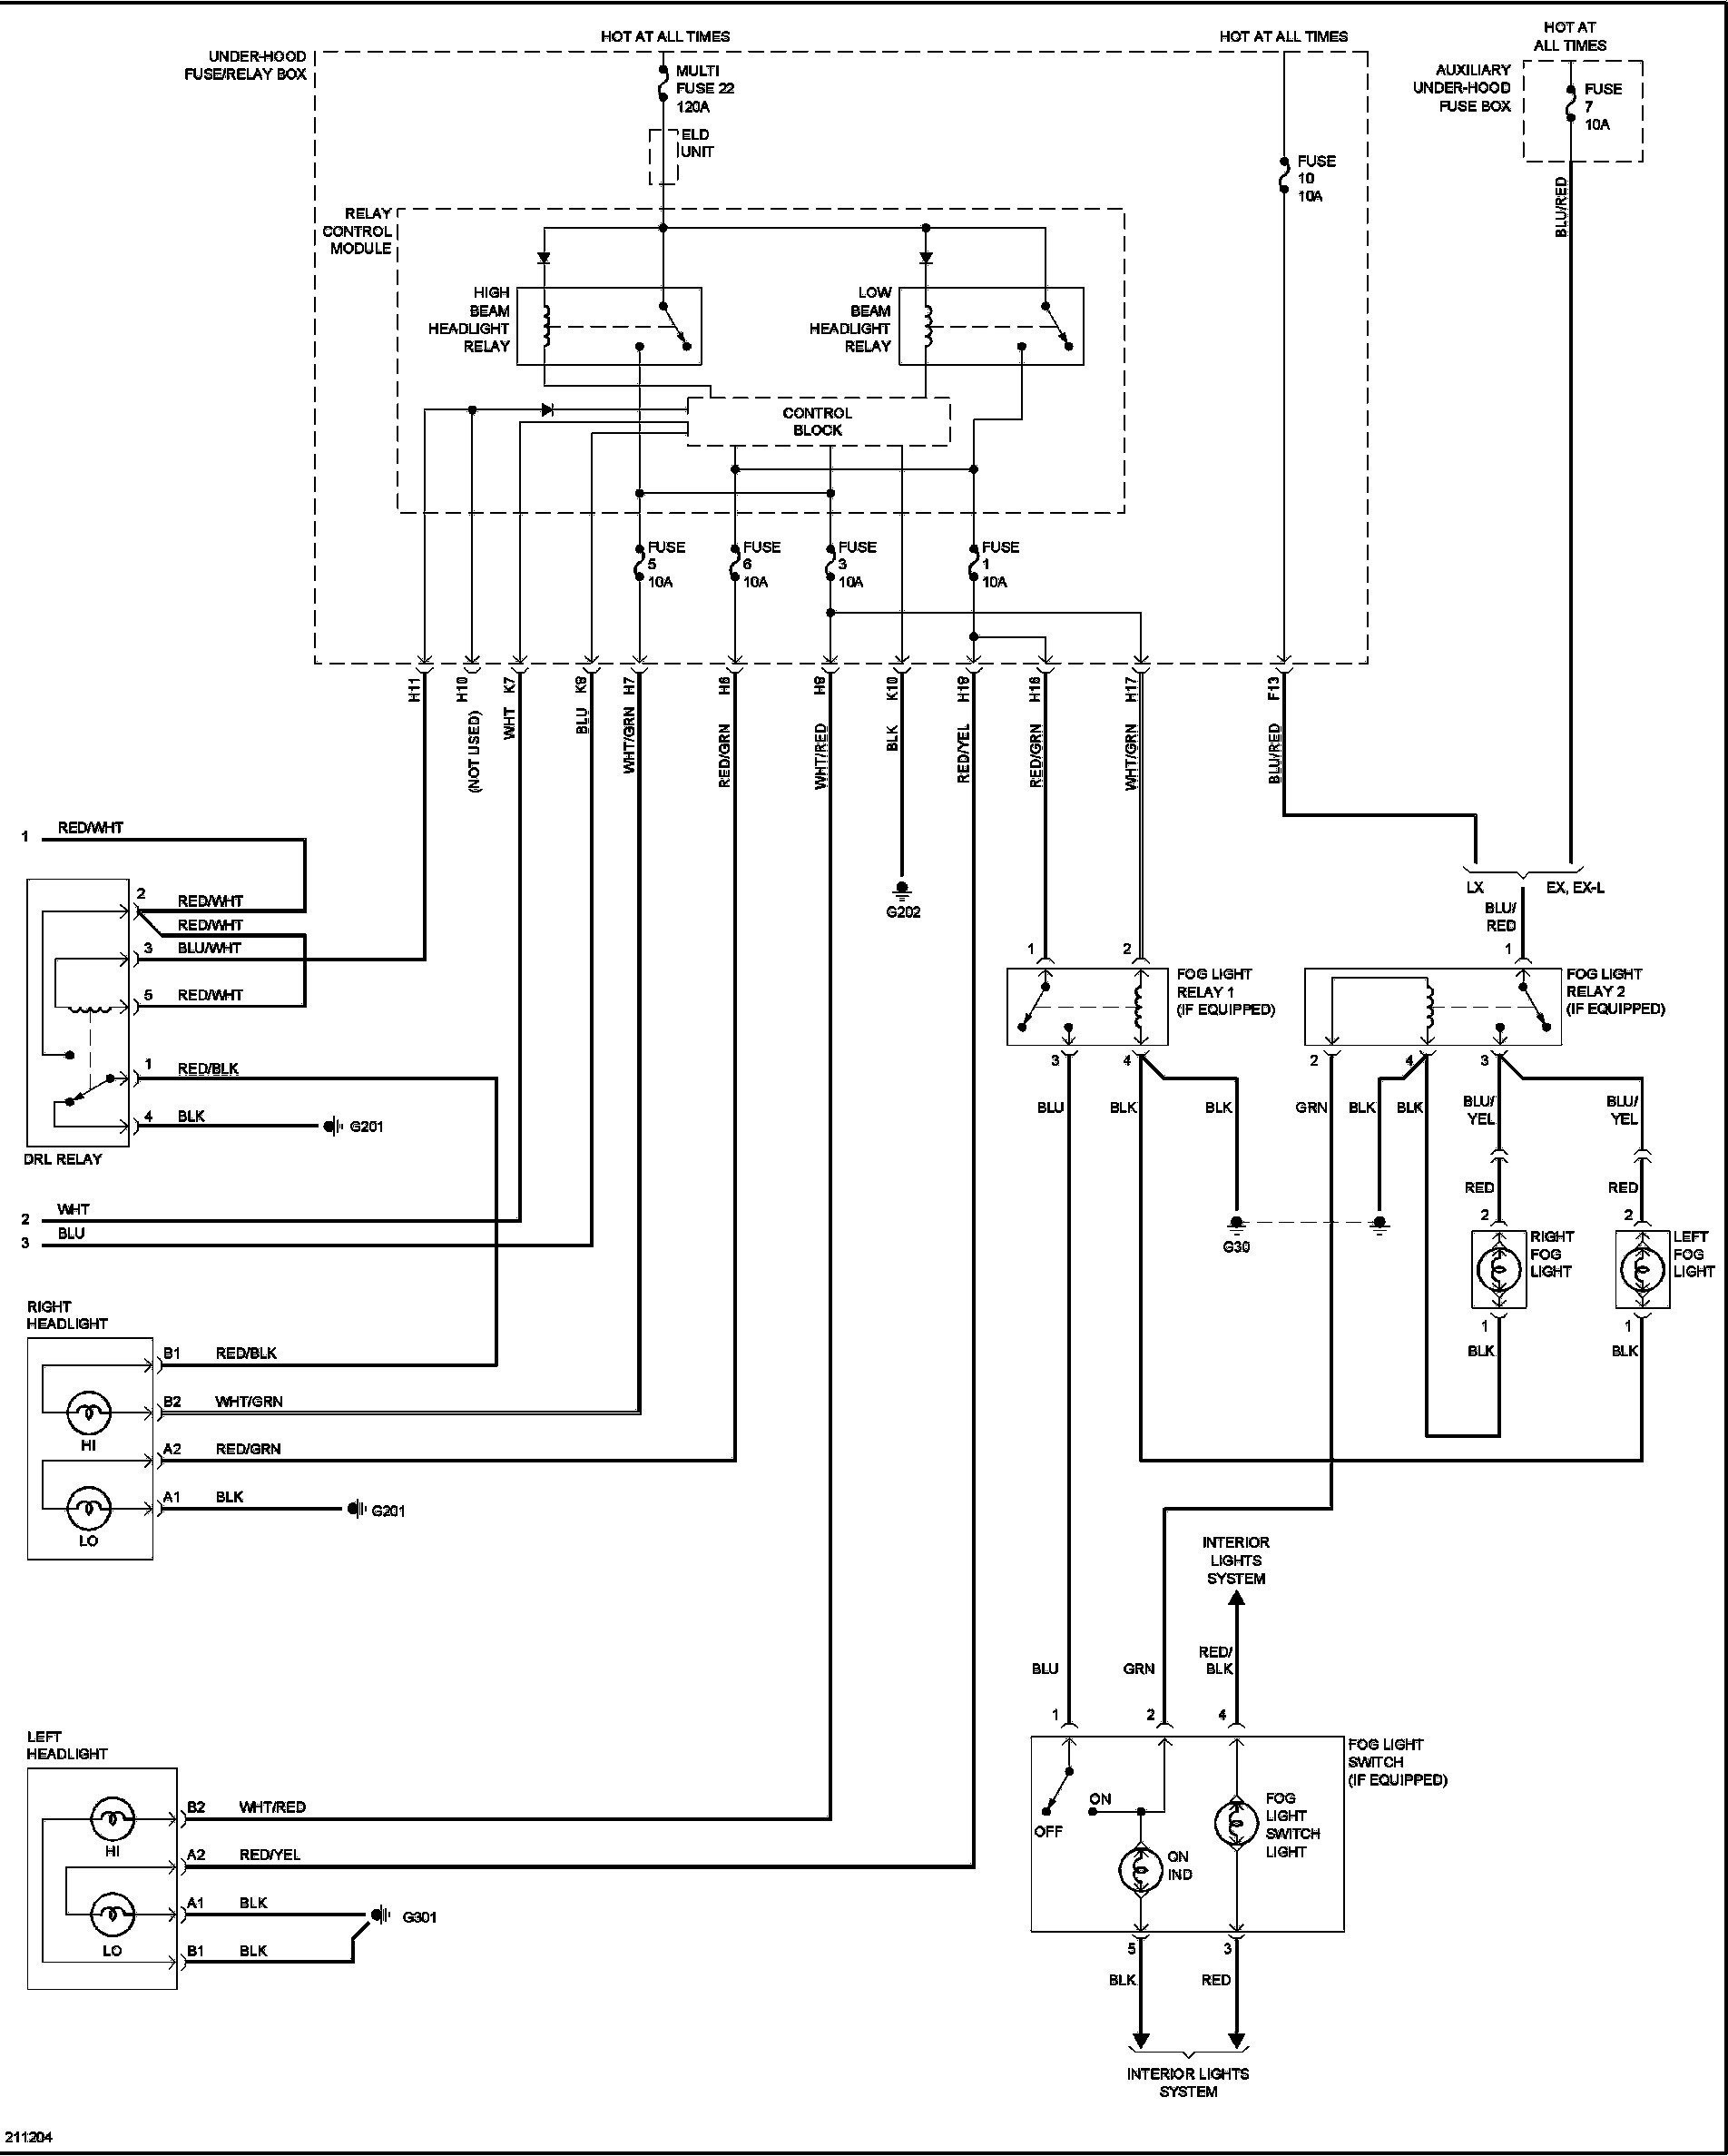 Civic Obd2 Wire Harness Schematic - Wiring Diagram M10 on